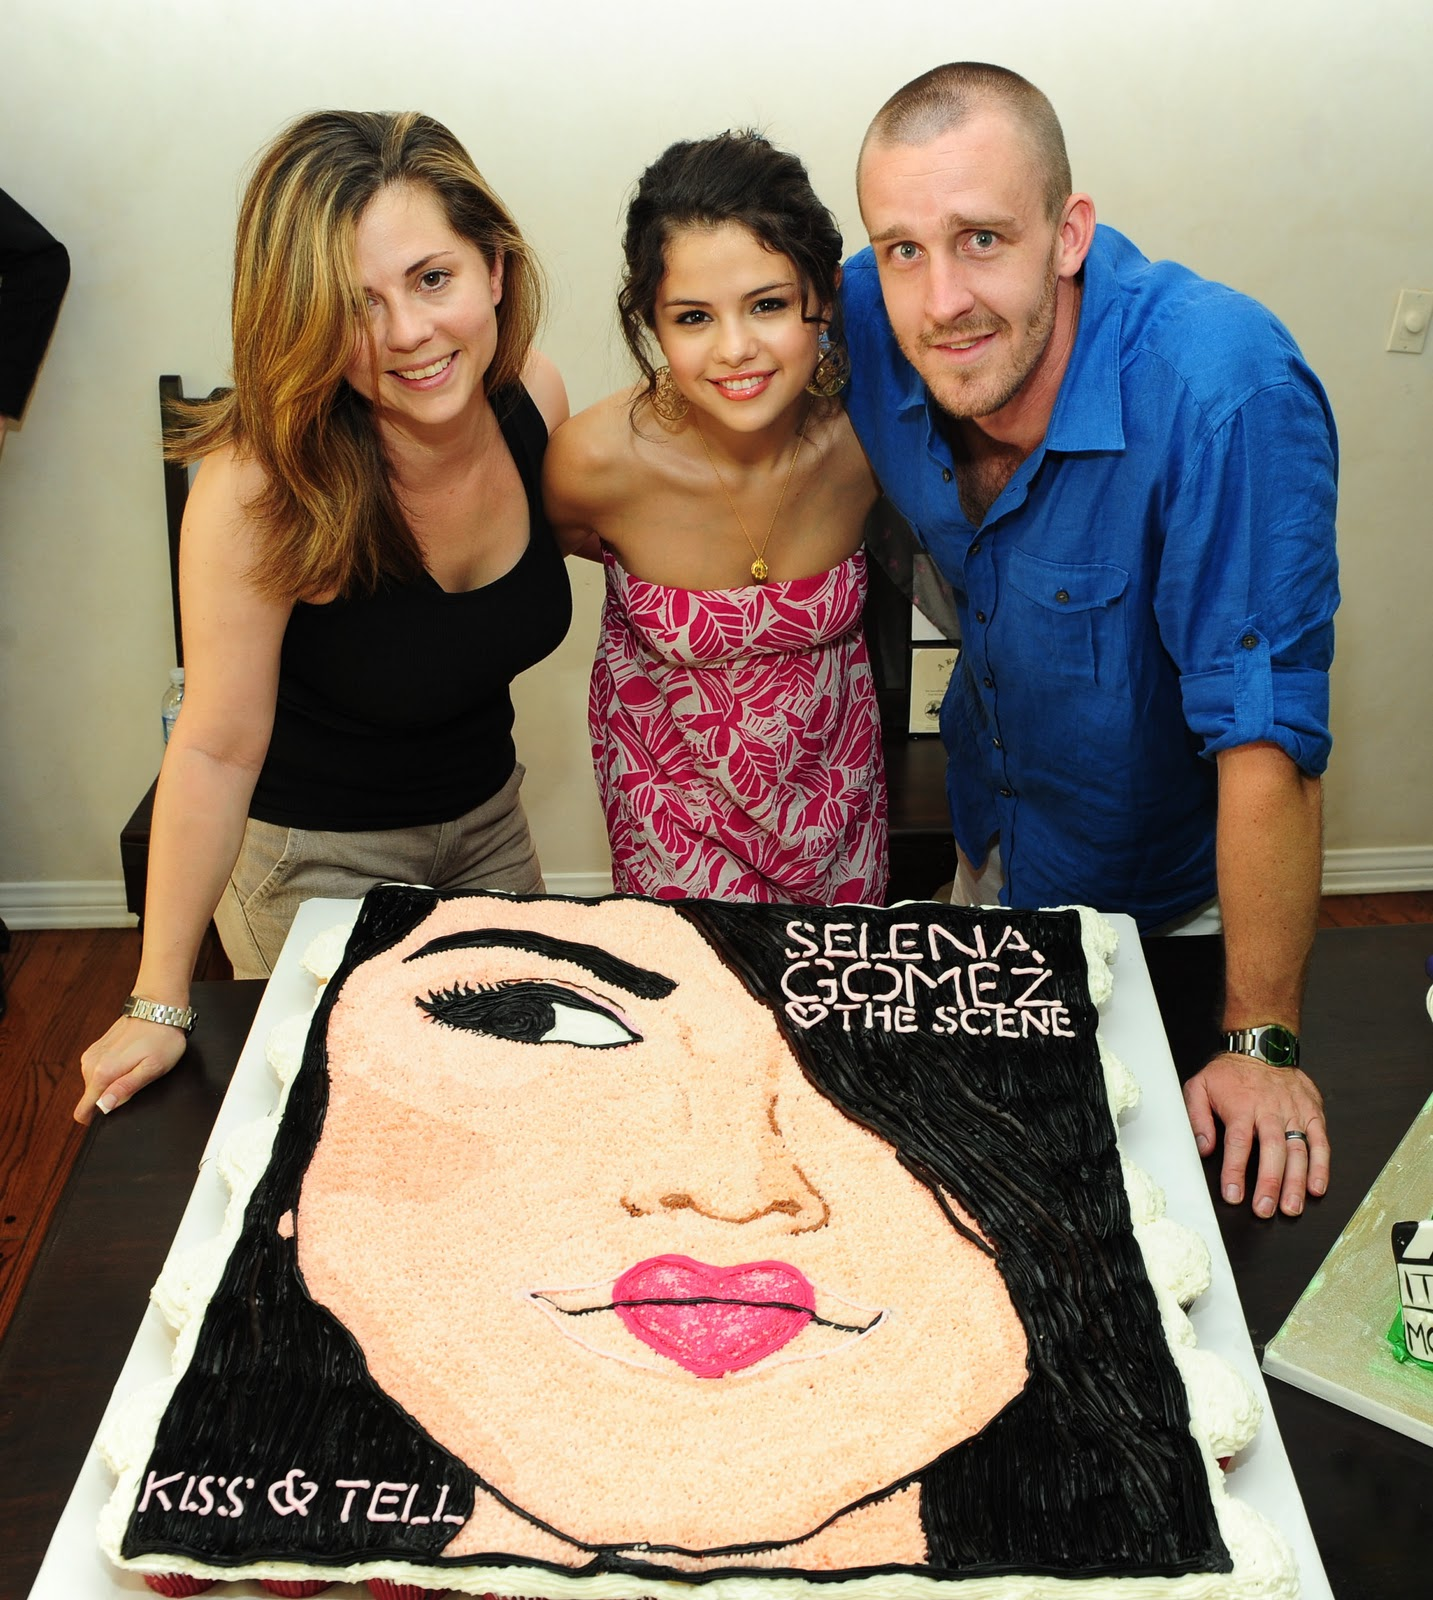 http://1.bp.blogspot.com/_yZ_80Tku9aI/TUXzsy-G4PI/AAAAAAAAACw/sA5bh4yF3w8/s1600/91940-selena-gomez-celebrates-her-18th-birthday-at.jpg